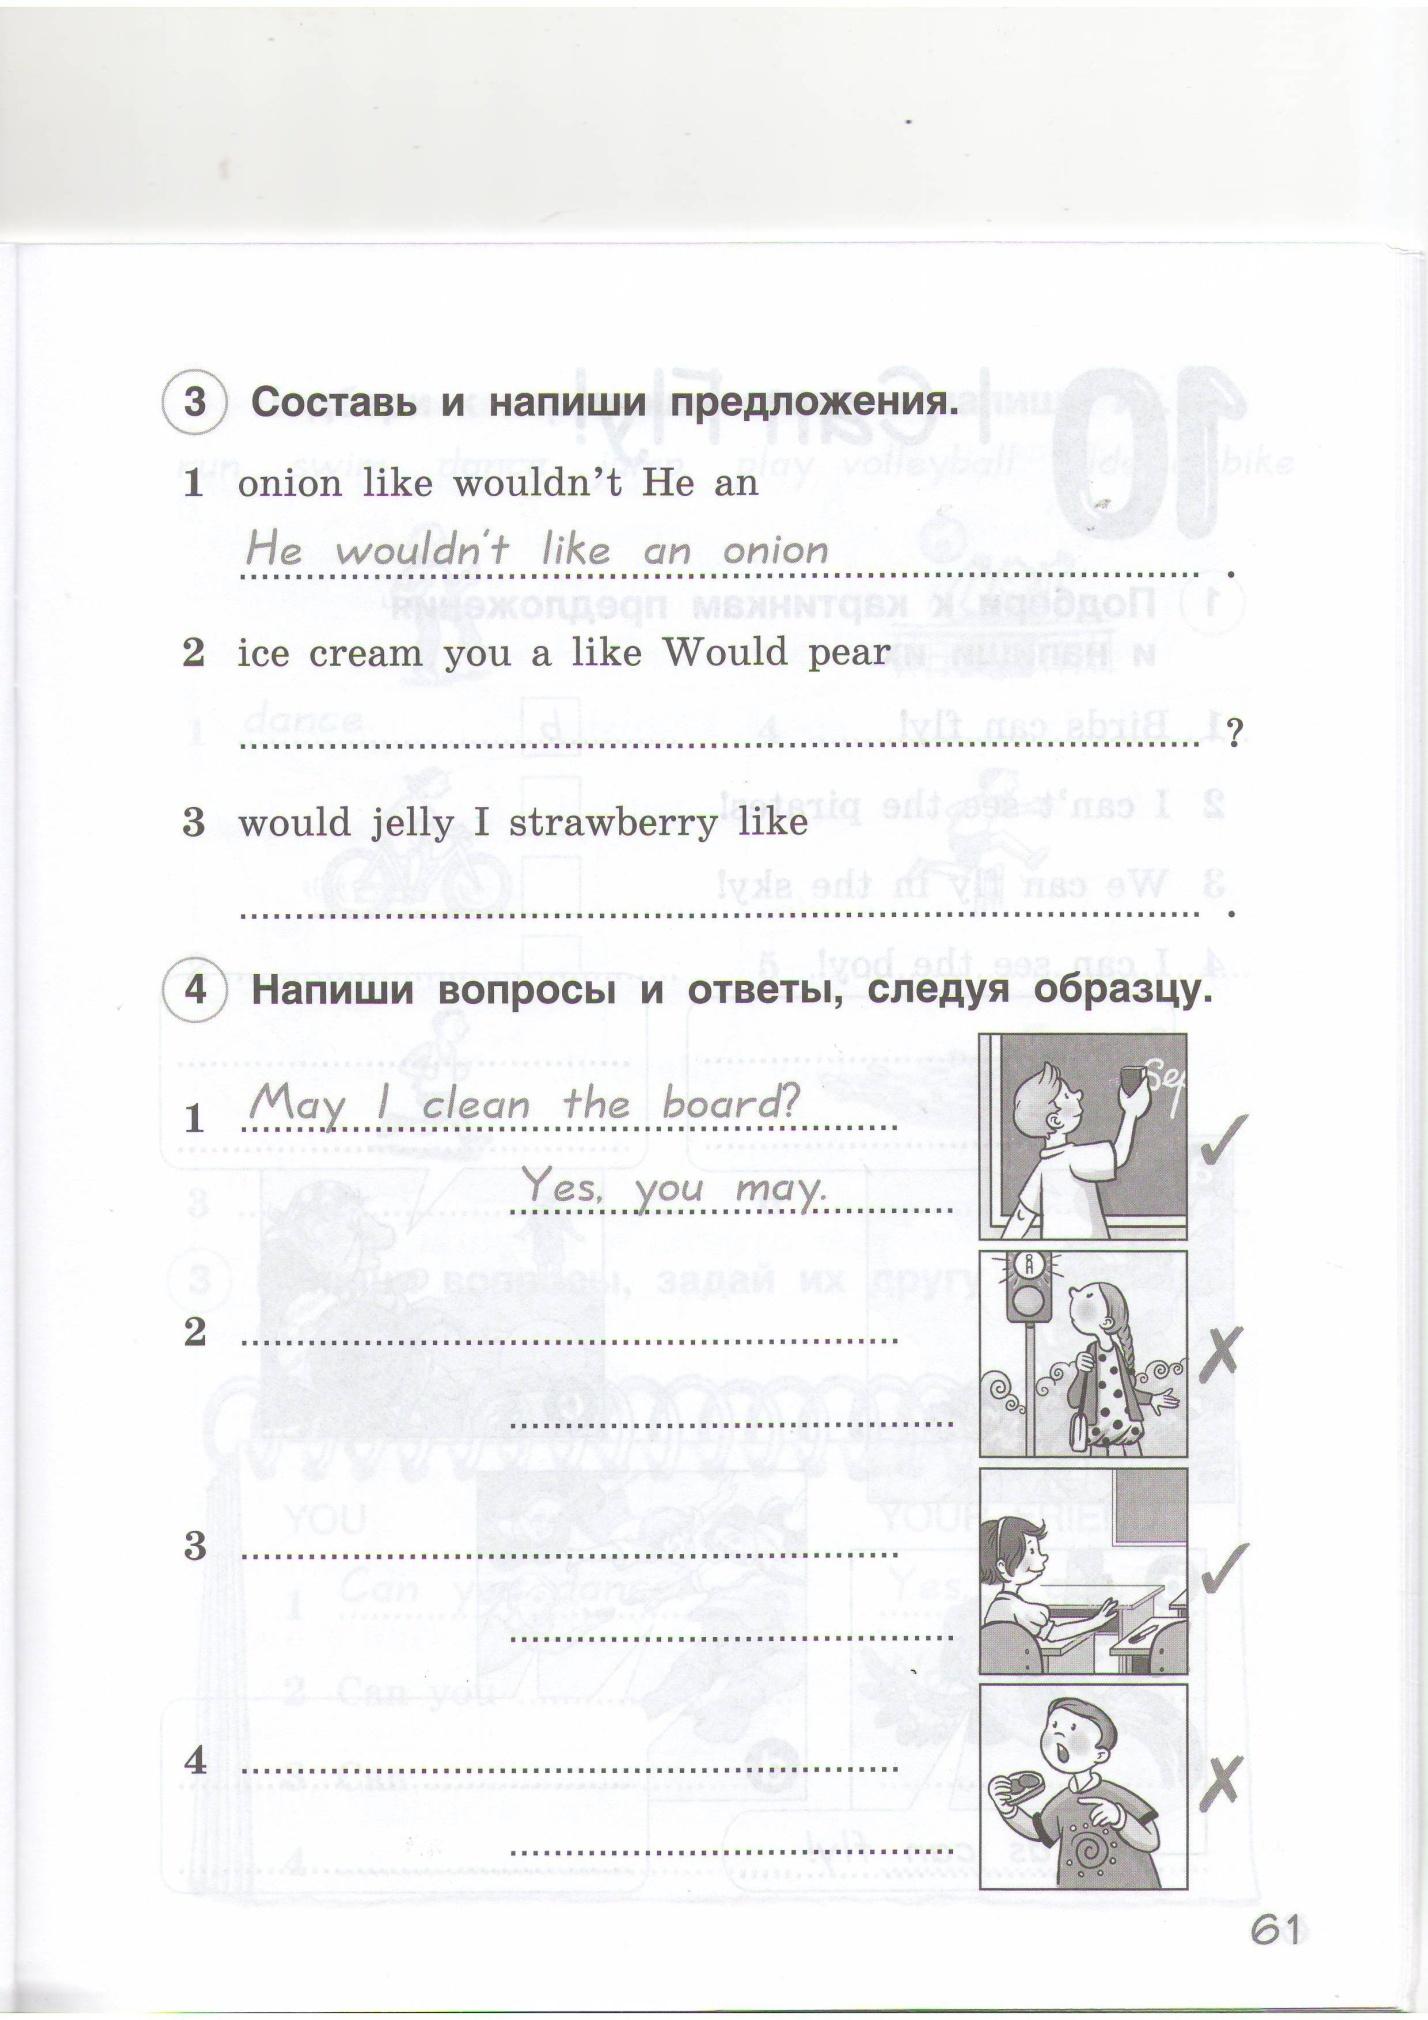 C:\Documents and Settings\ш3\Рабочий стол\2015-10-07\Изображение0007.JPG